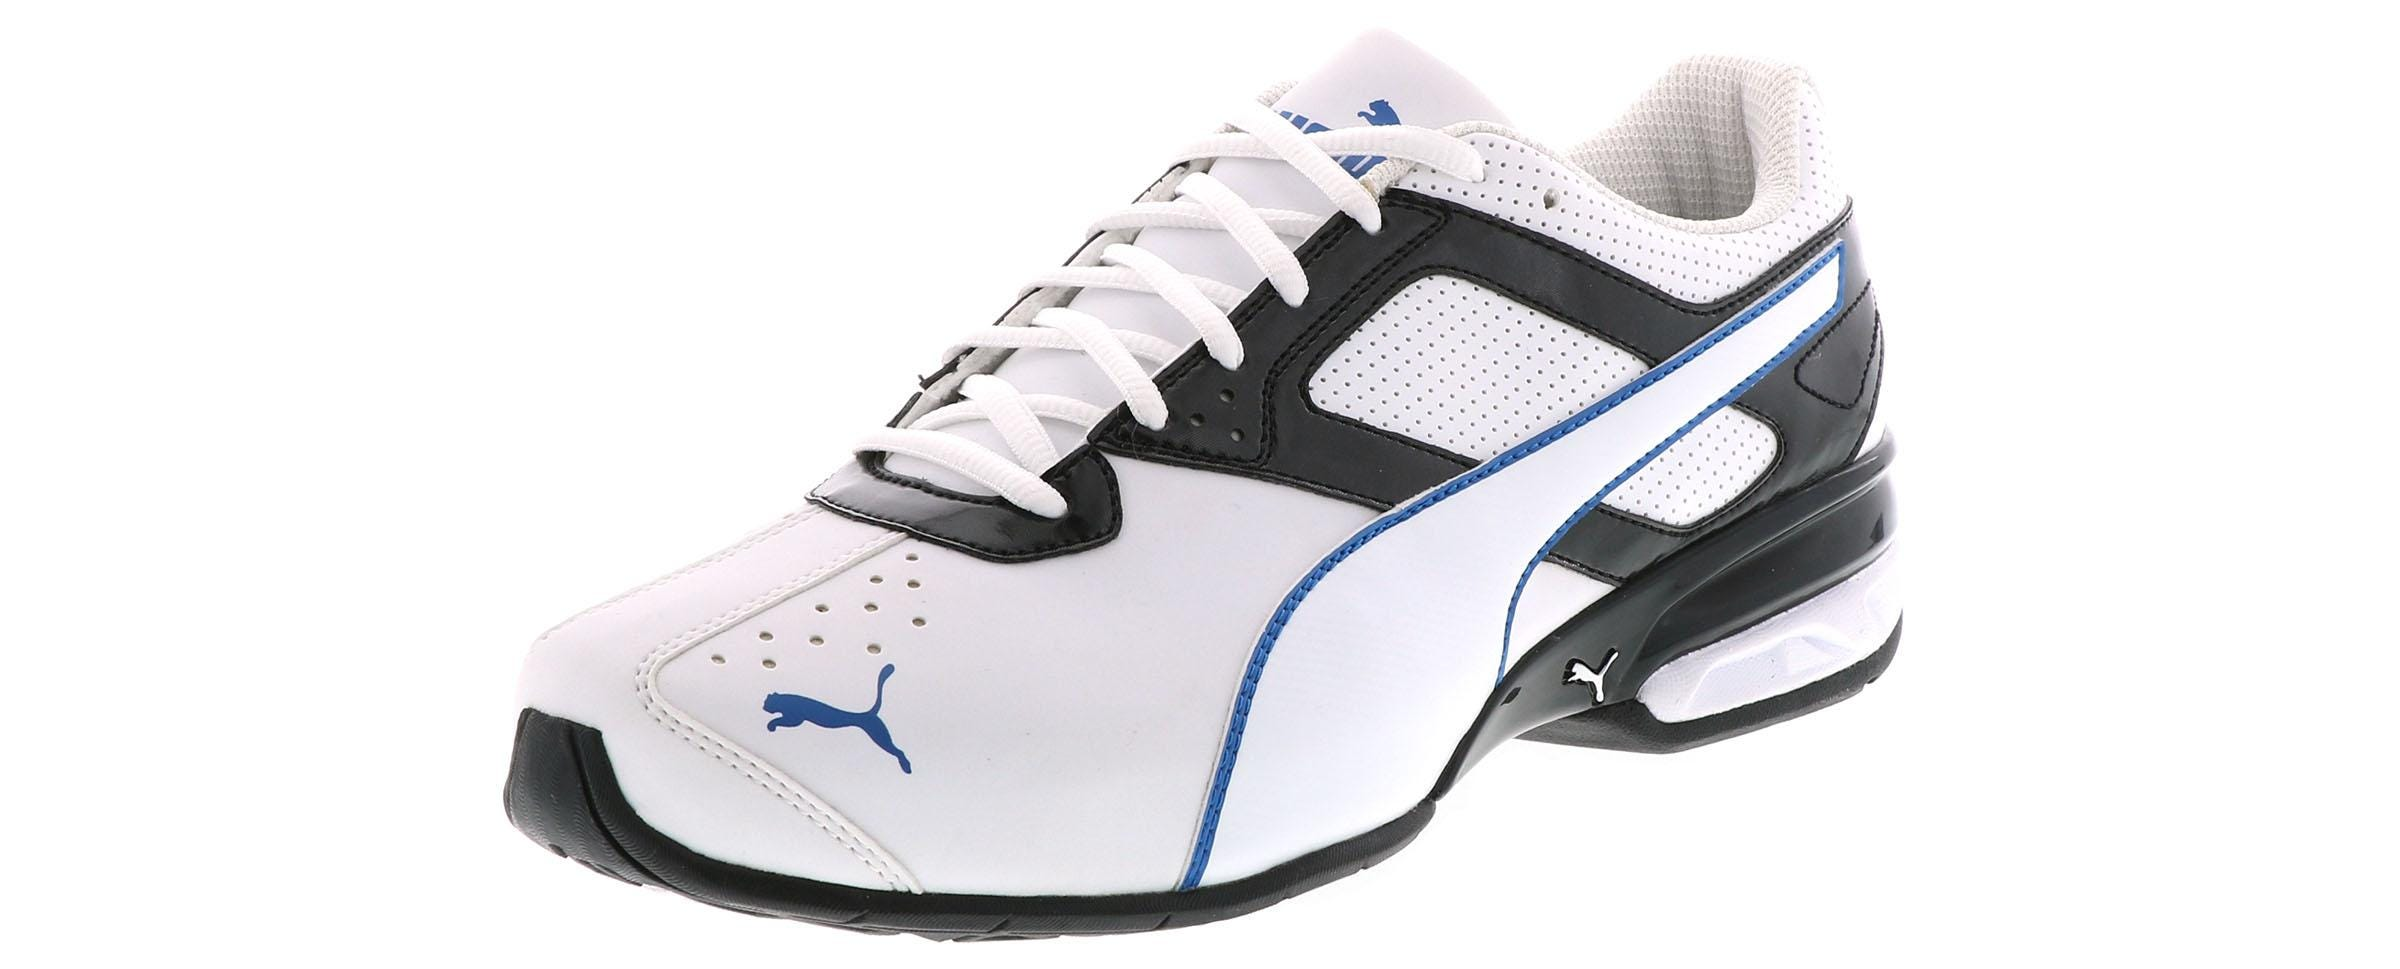 puma men's tazon 6 fm running shoe 01 ans